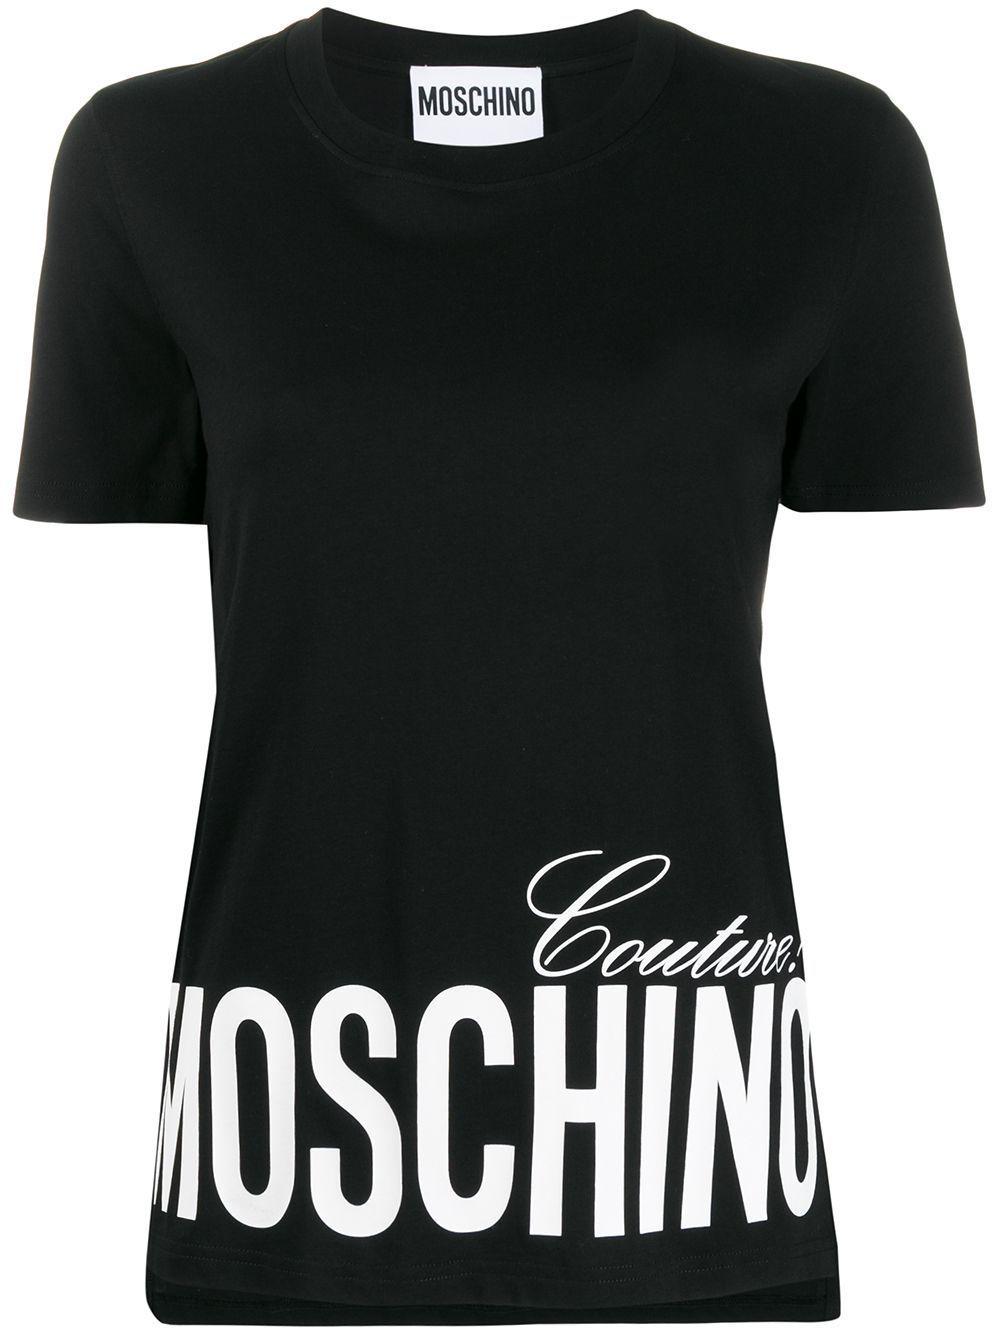 MOSCHINO WOMEN'S A070305401555 BLACK COTTON T-SHIRT